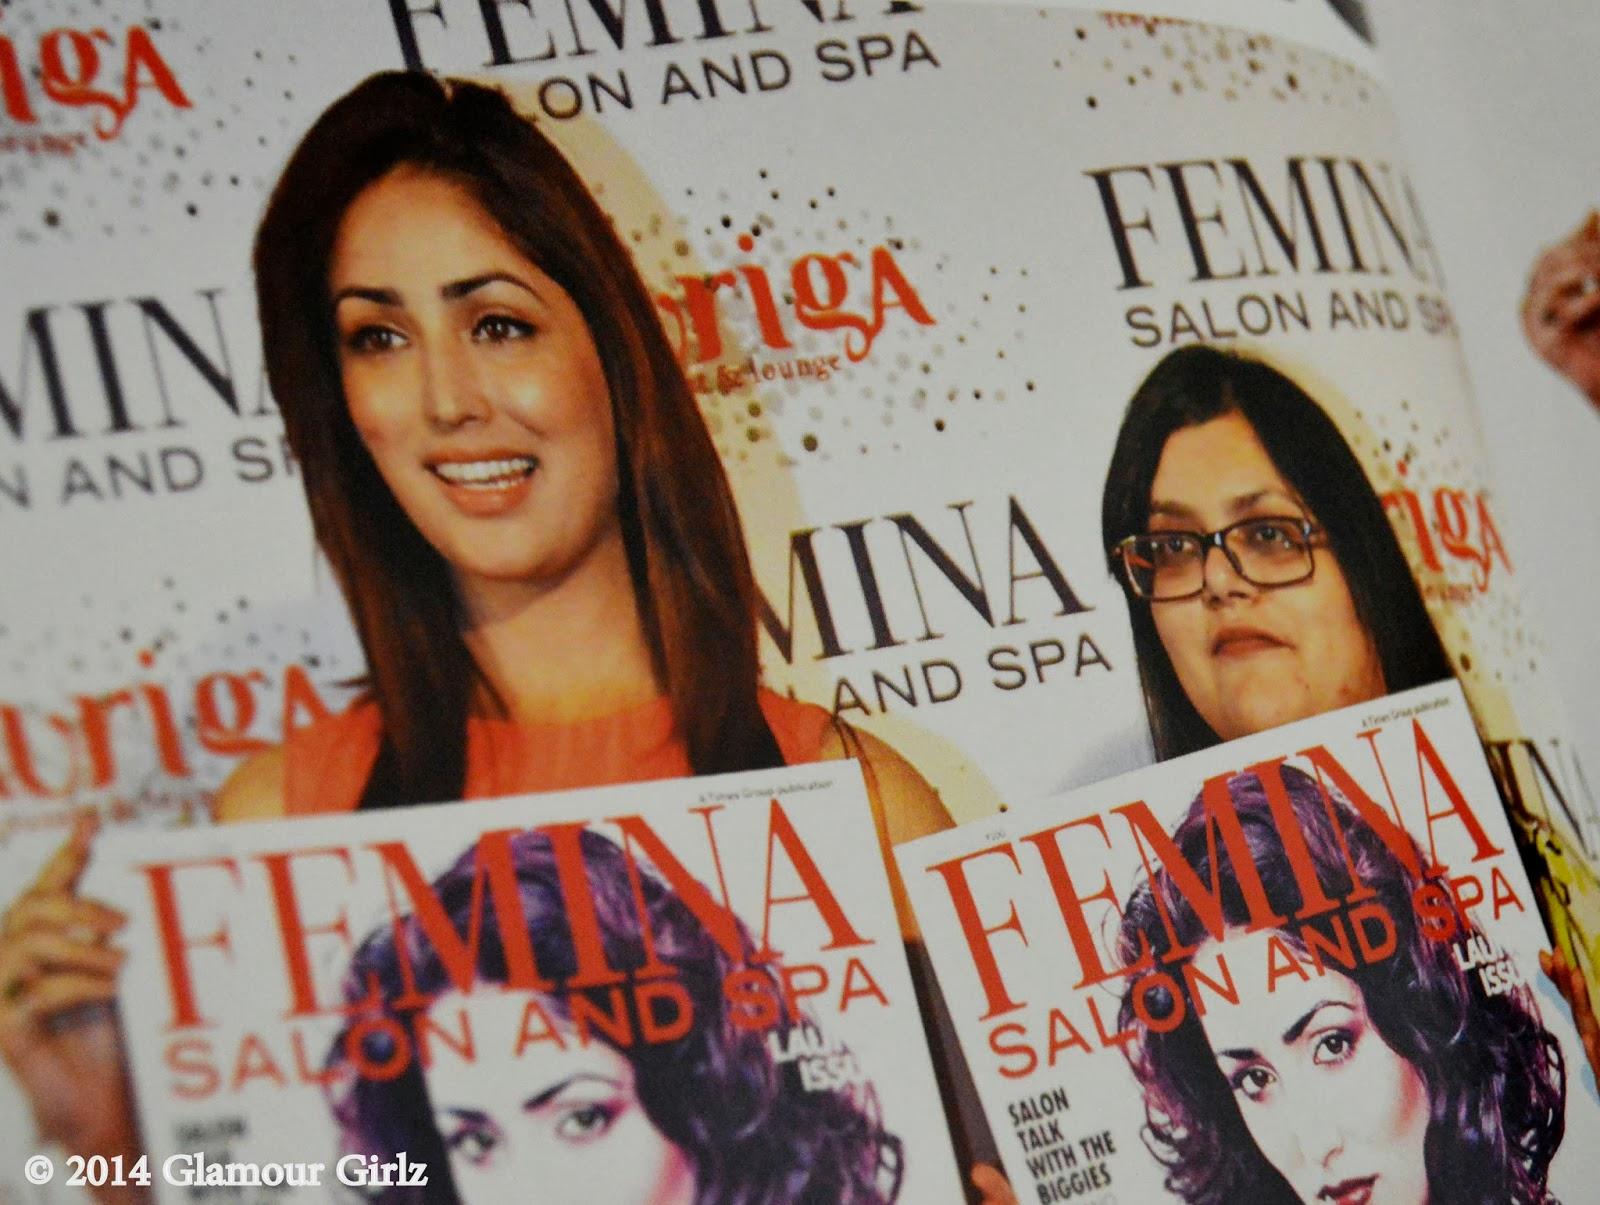 Yami Gautam launches Femina Salon & Spa in December 2013